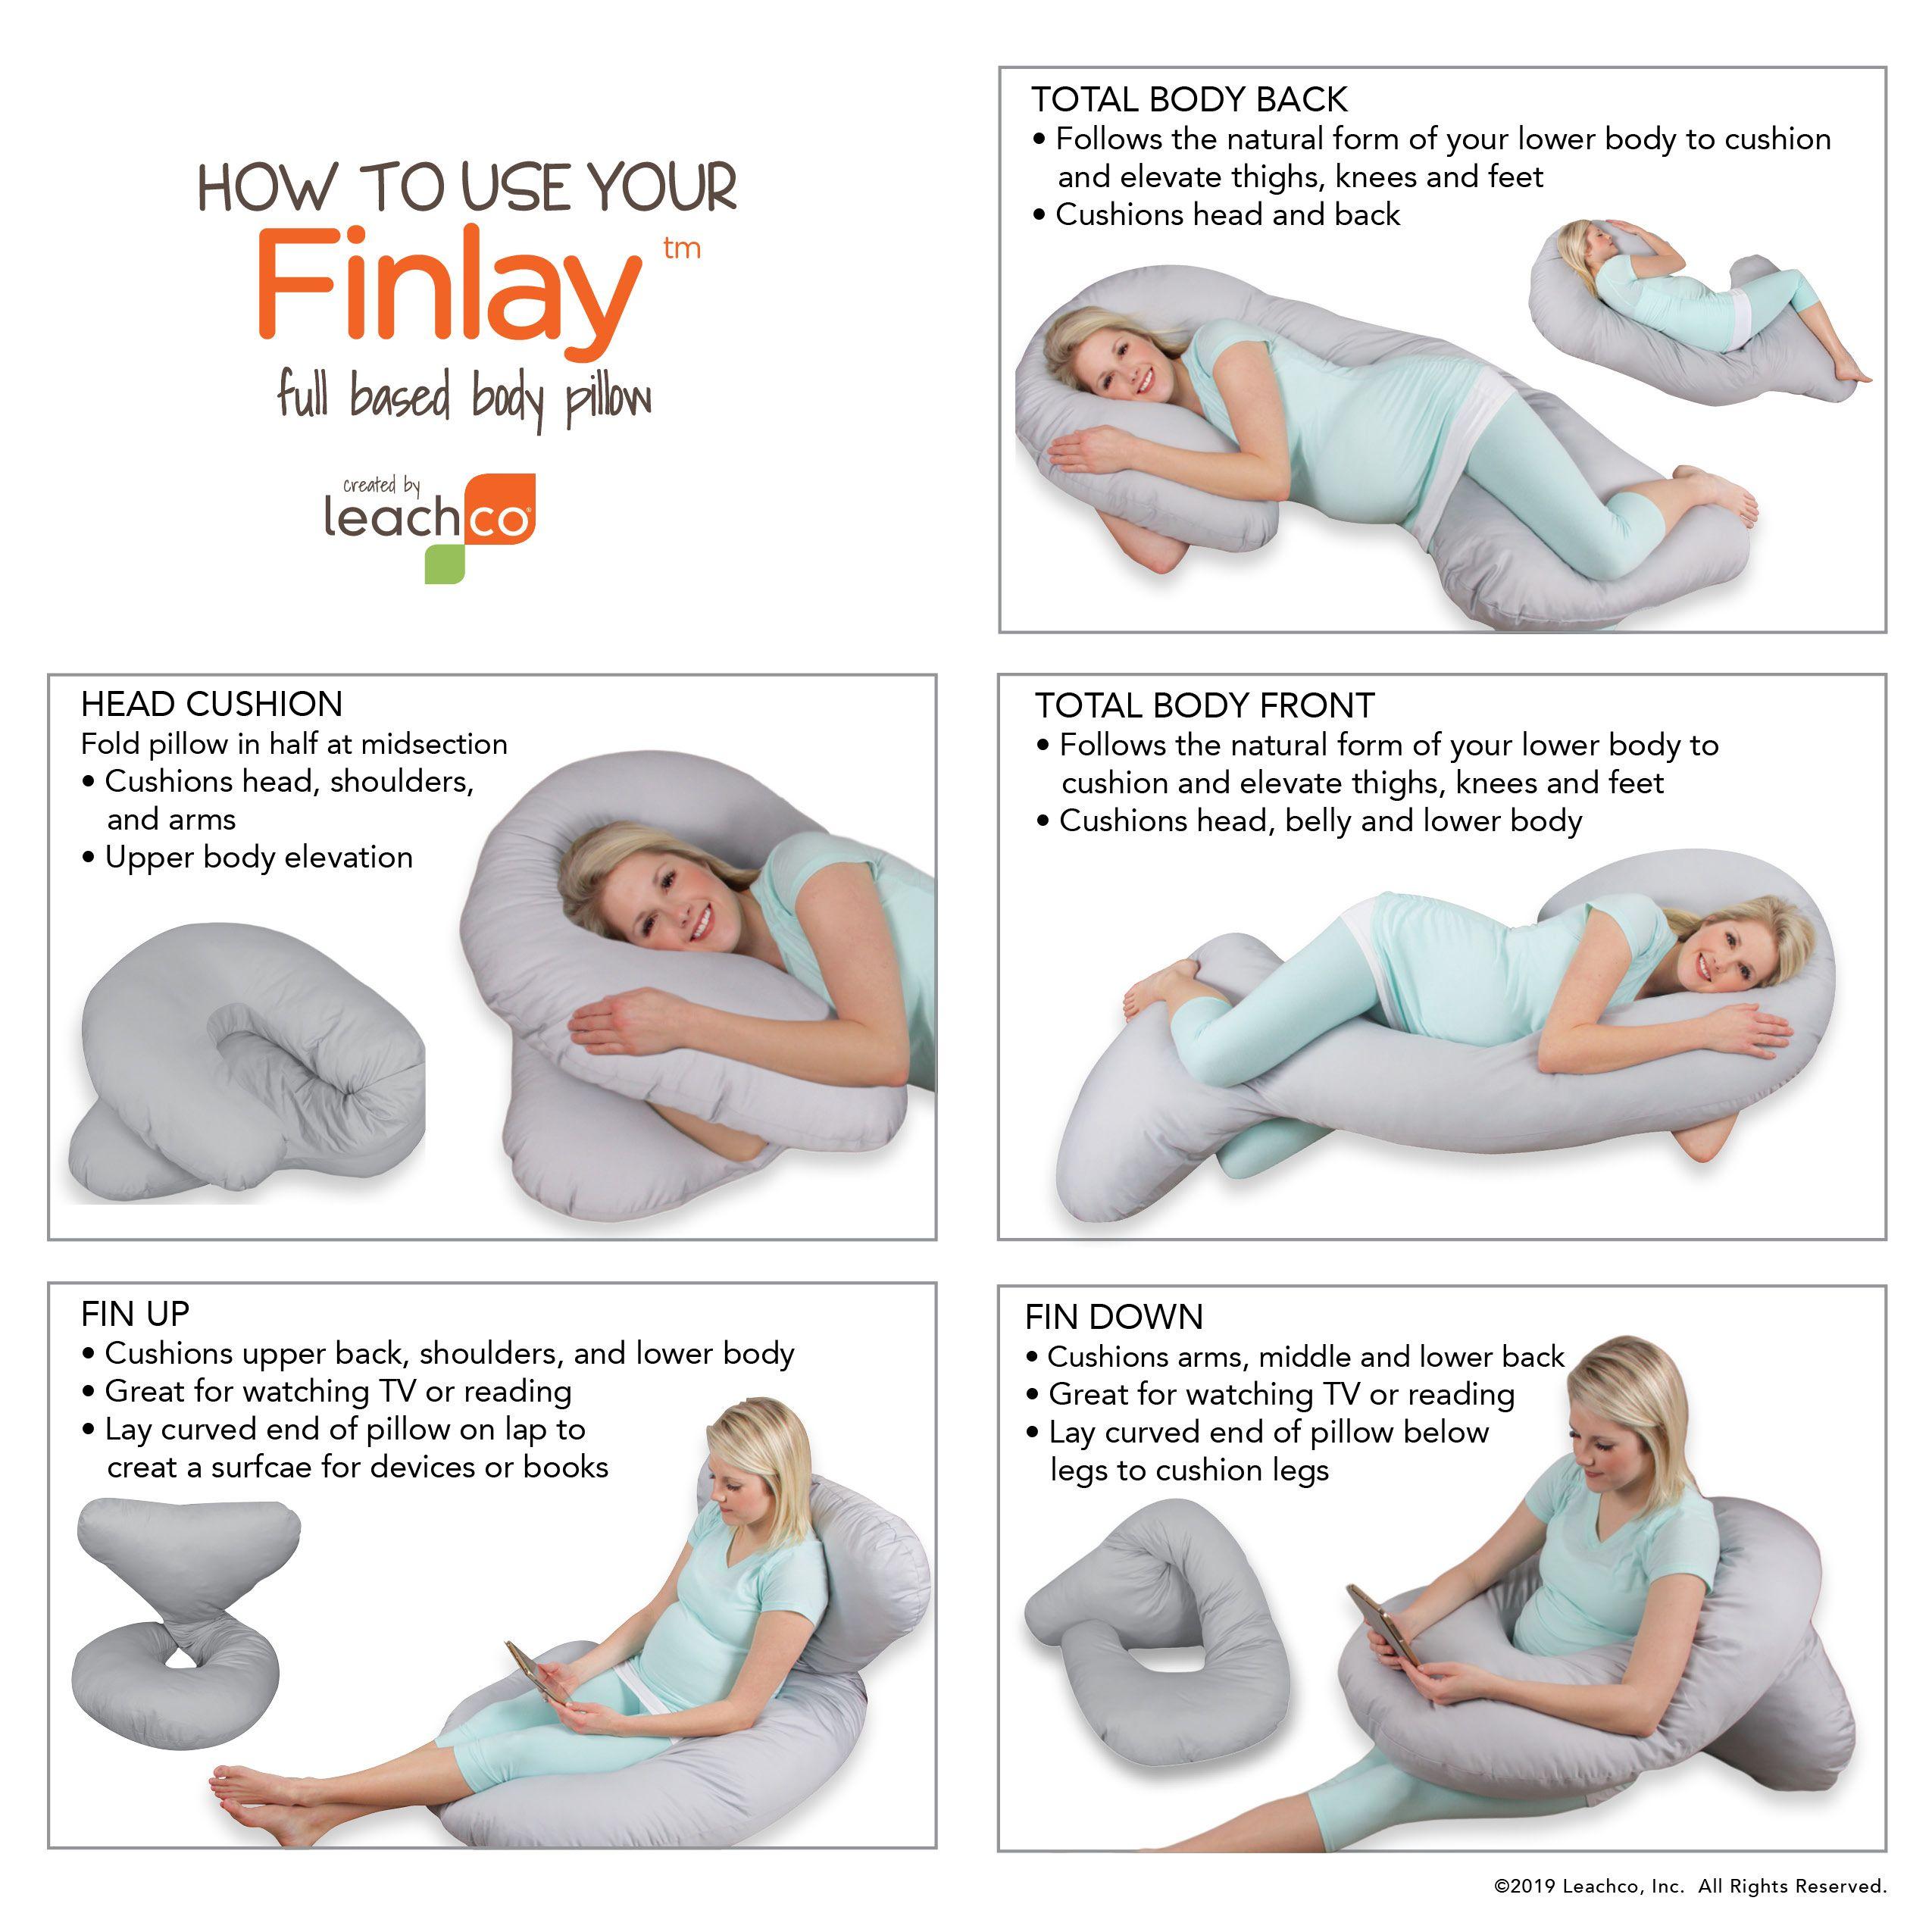 finlay body pillow body cushion